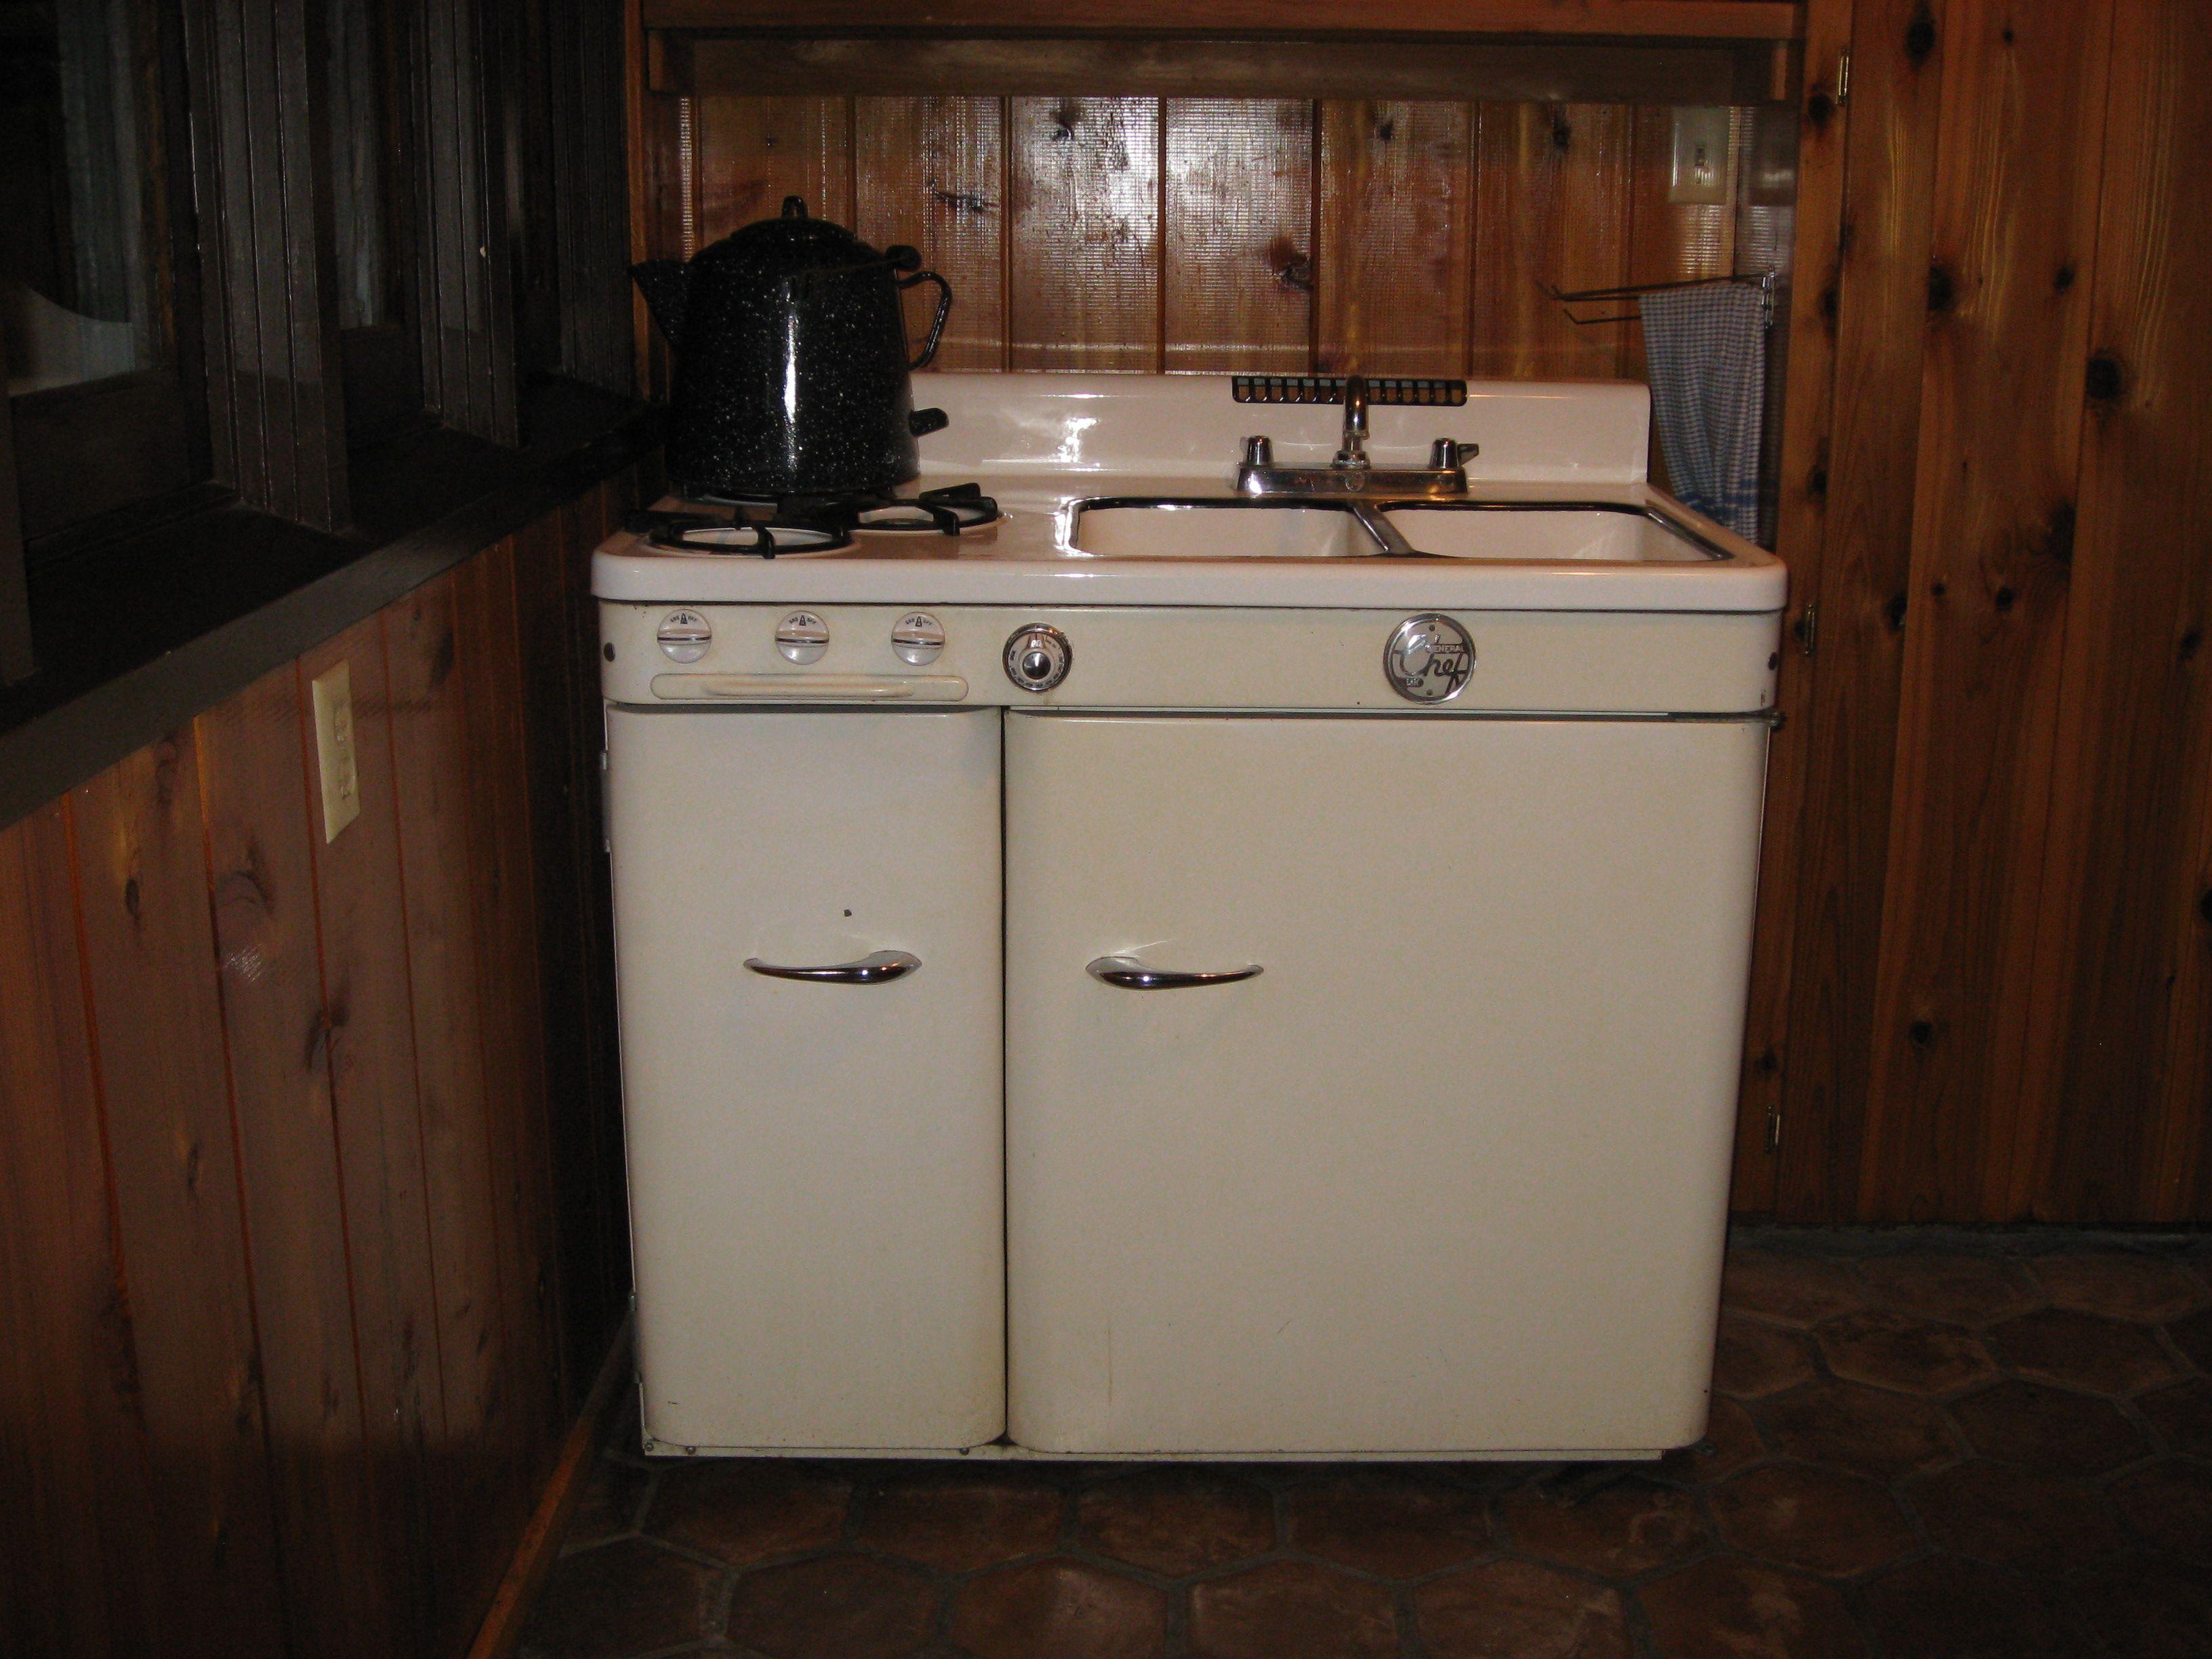 Vintage Stove Sink Refrigerator Combo